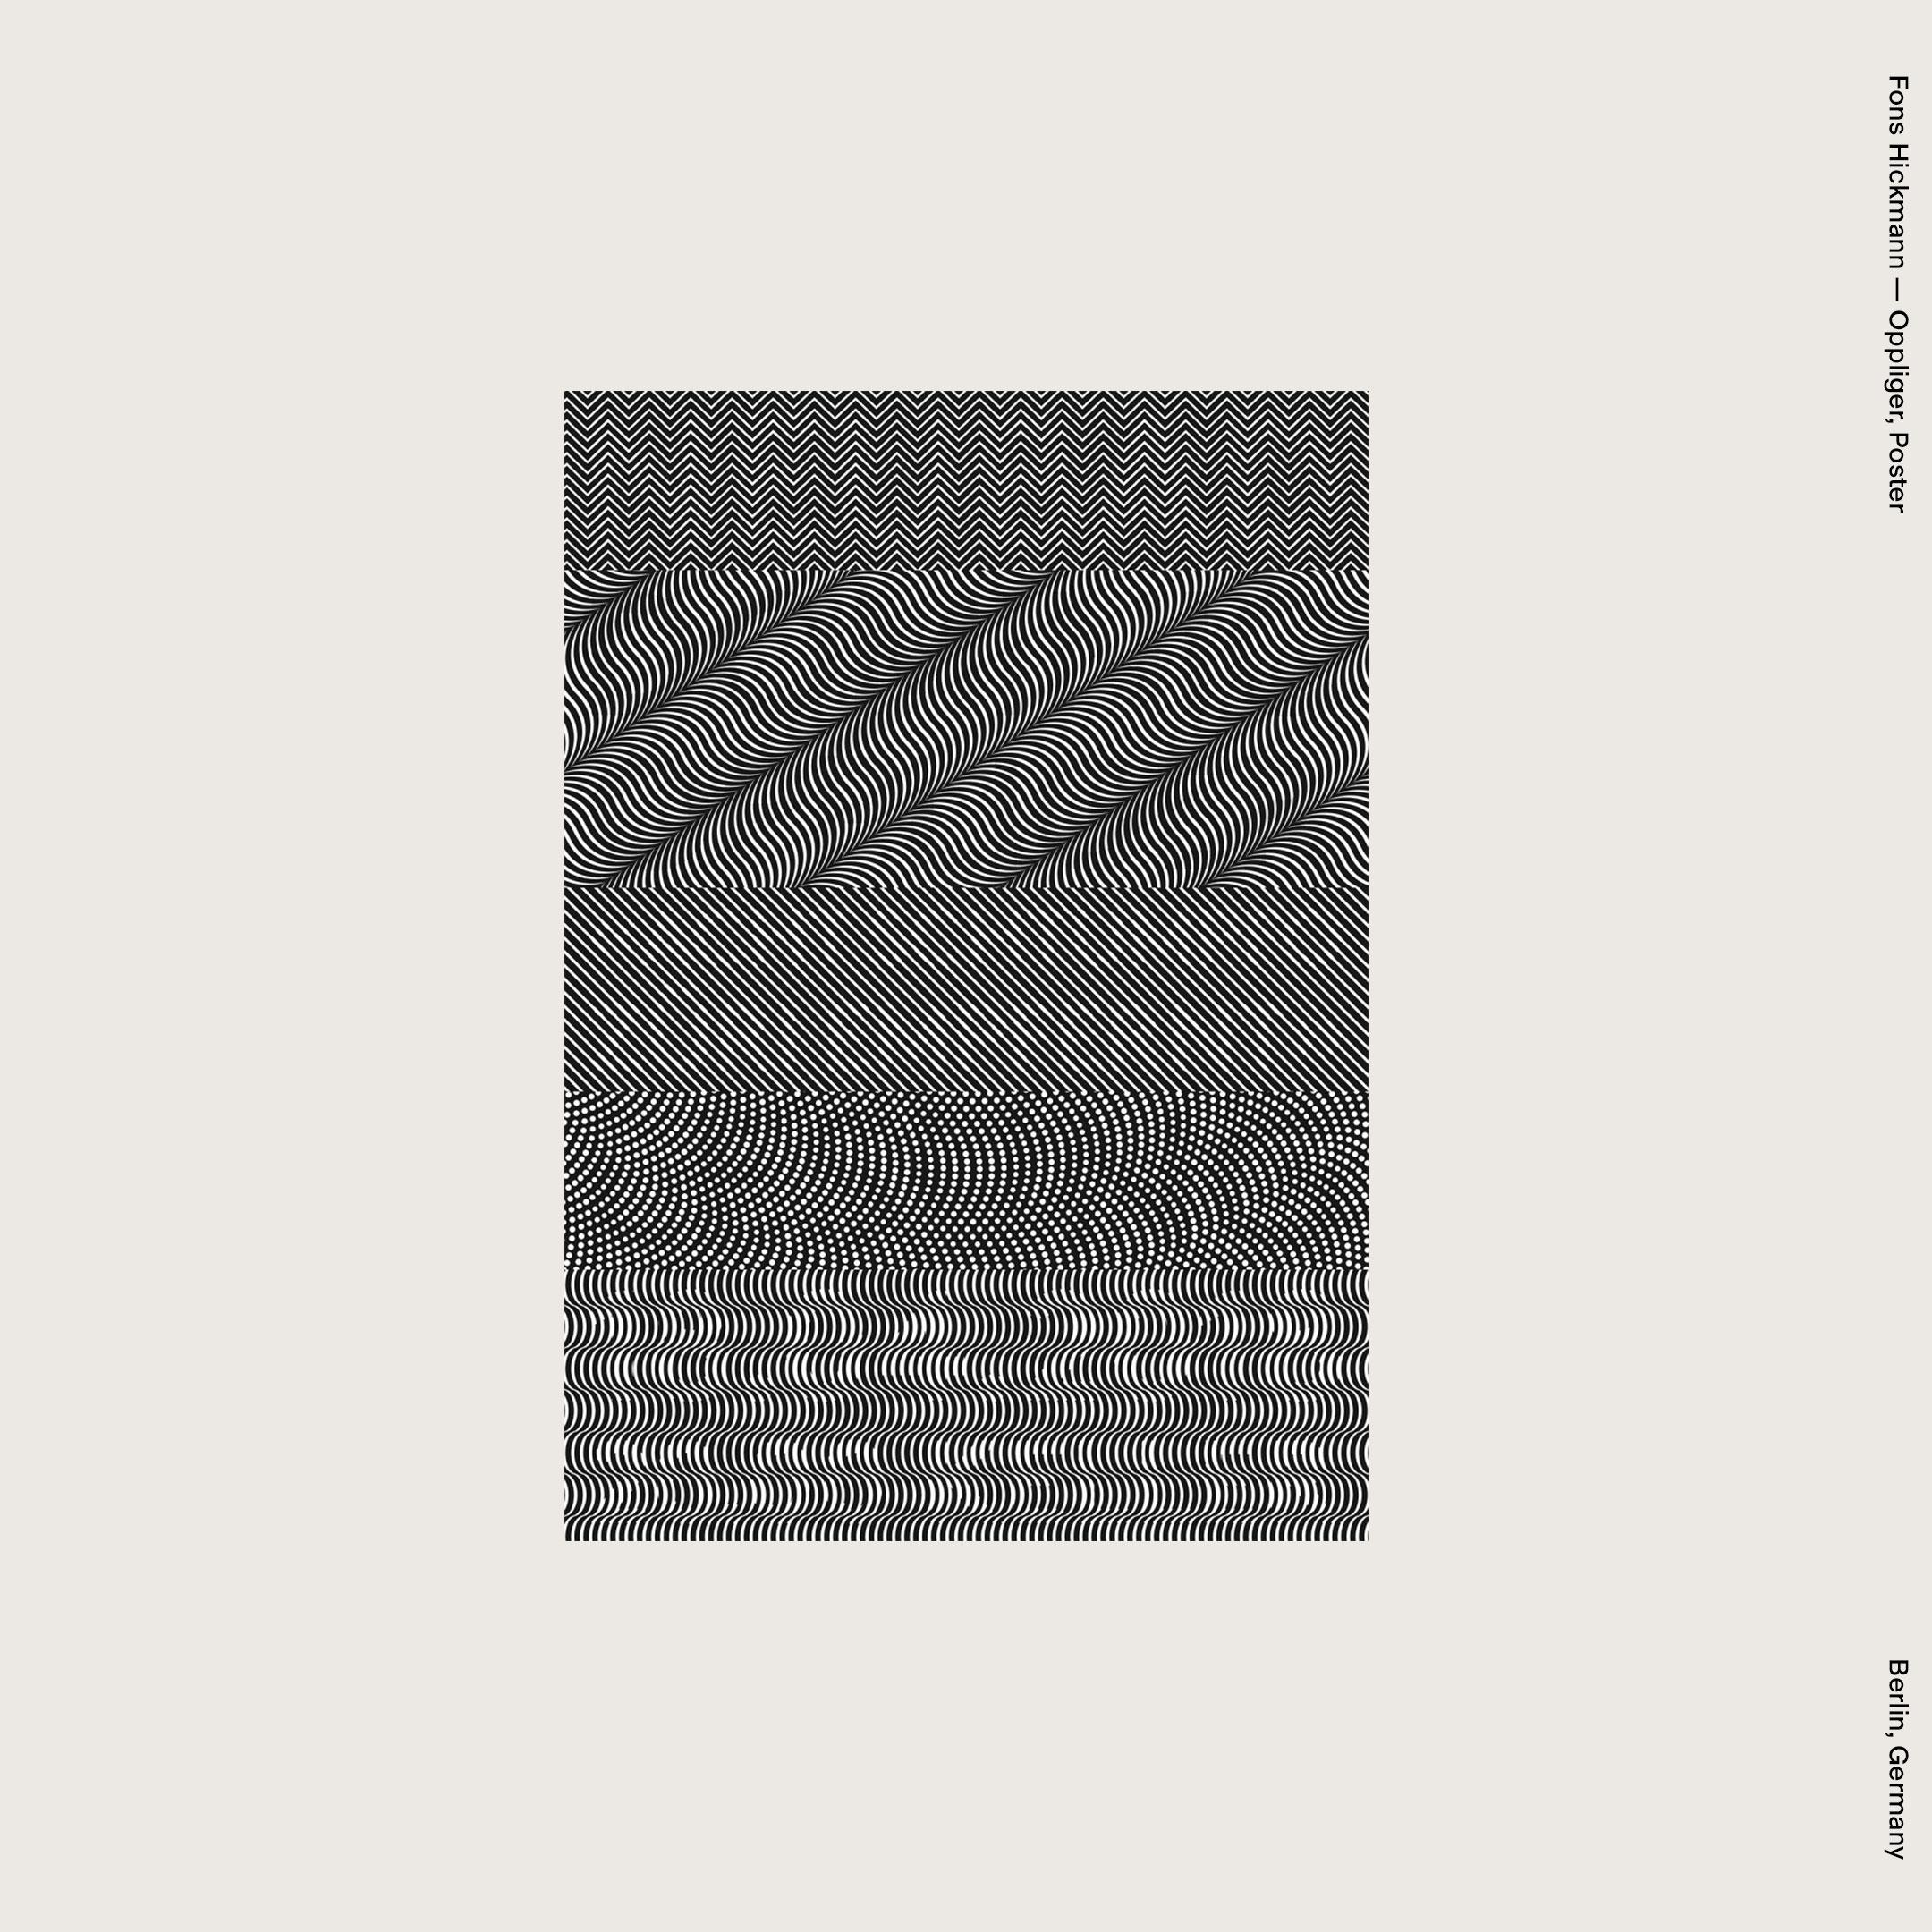 Fons Hickmann — Oppliger, Poster